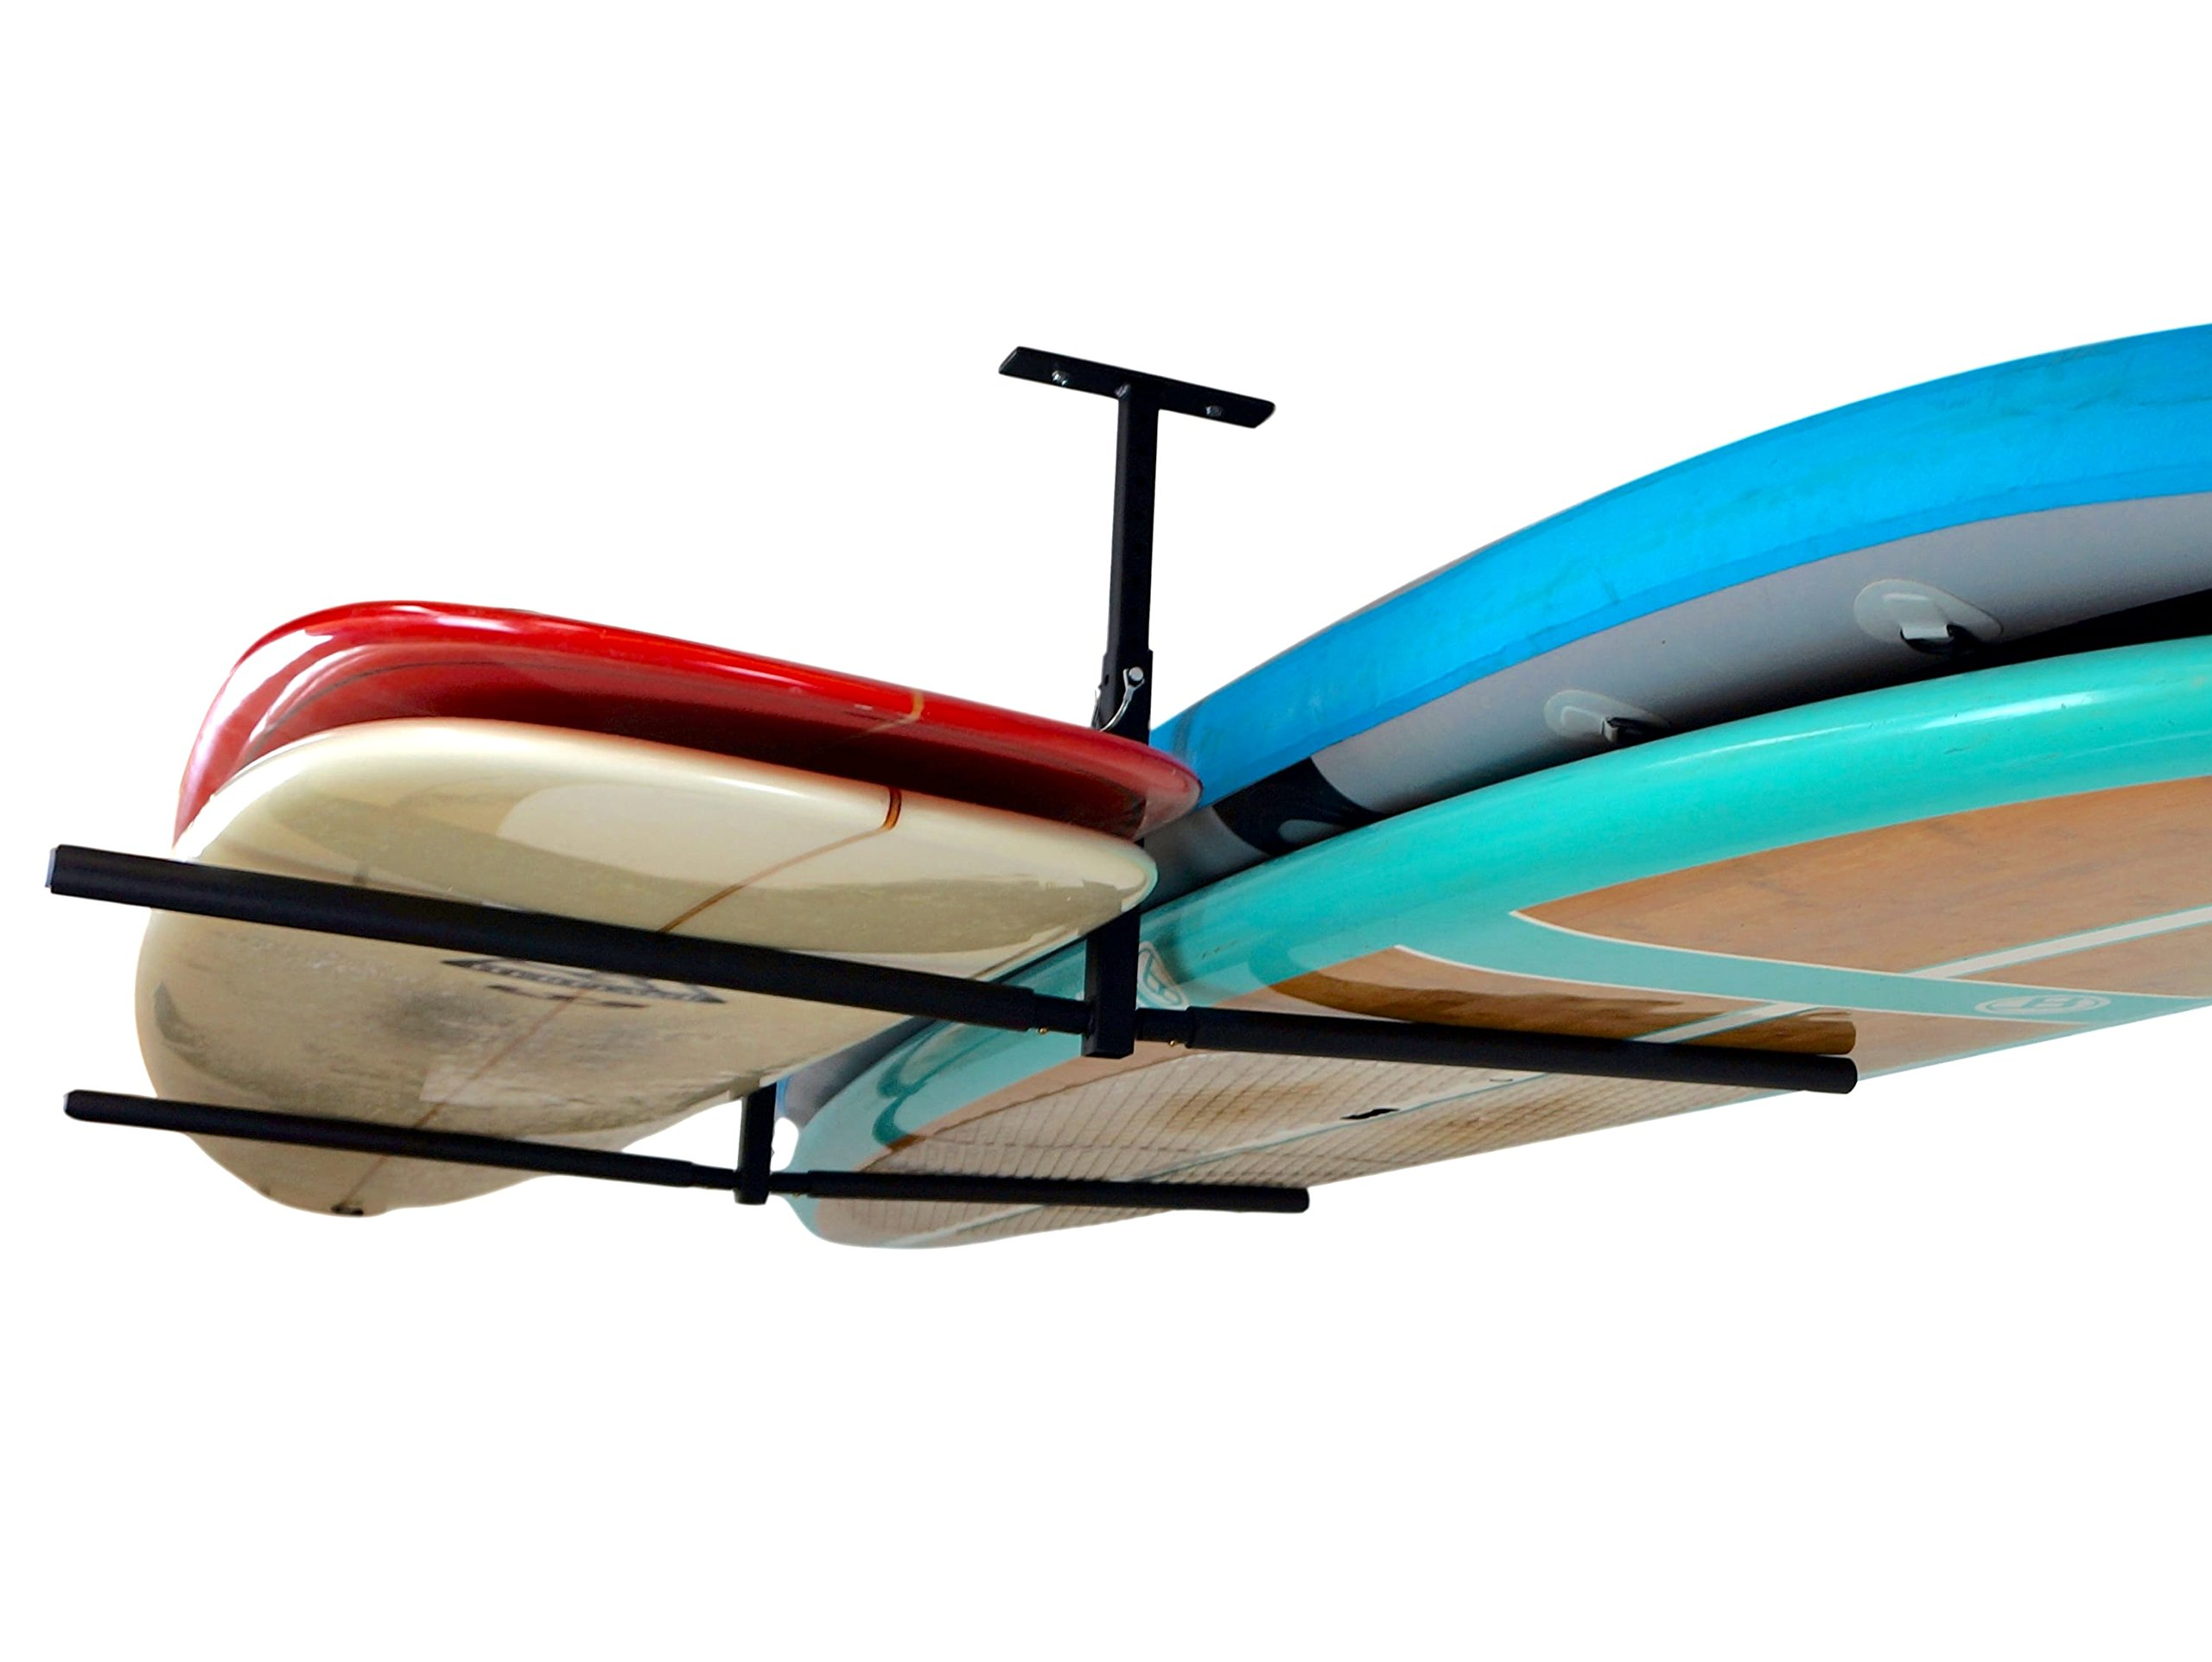 Double SUP & Surf Ceiling Storage Rack - Hi-Port 2 Overhead Hanger Mount - Home & Garage